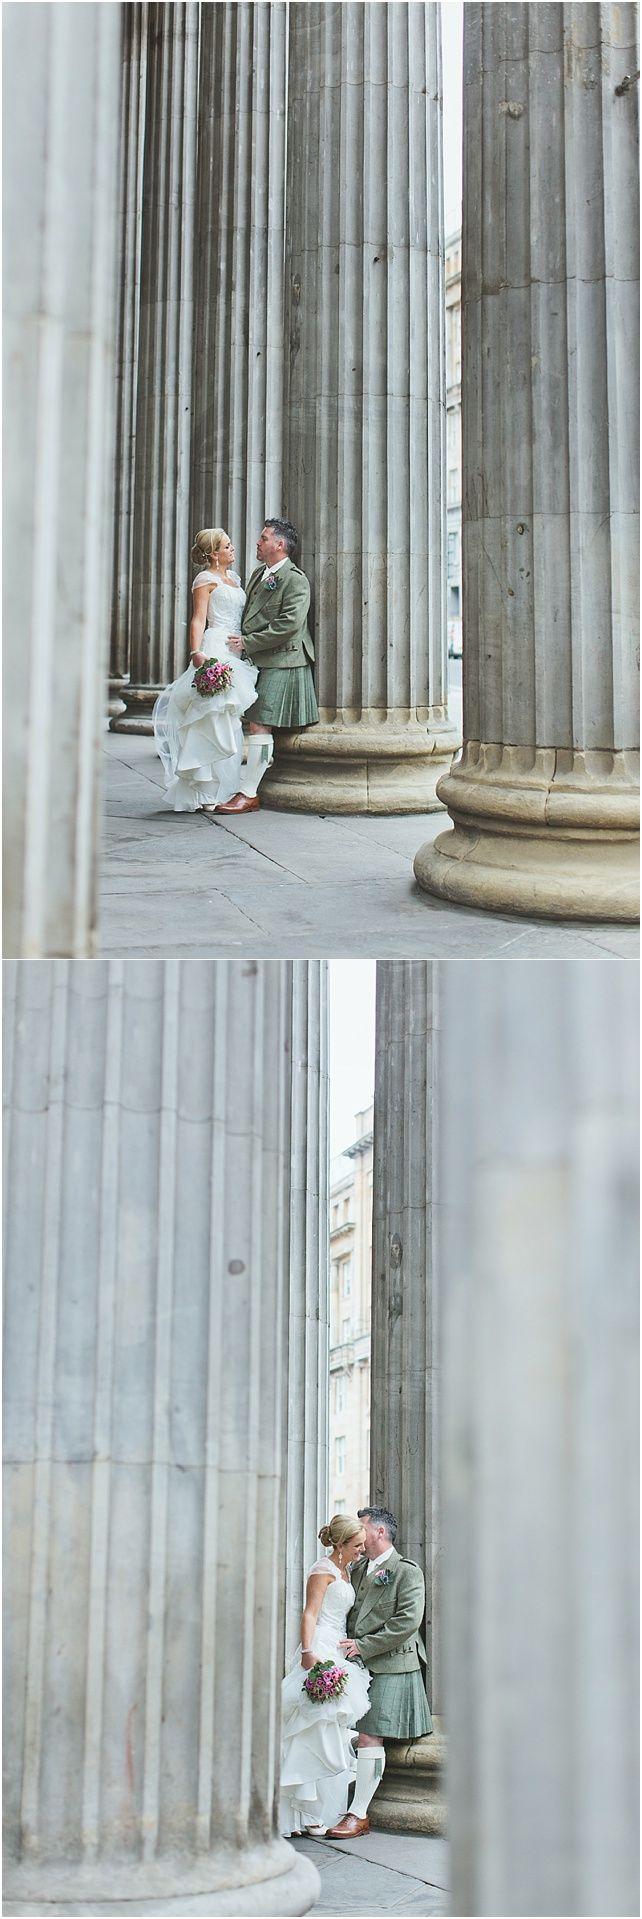 Wedding 29 royal exchange square // city wedding Glasgow // Chantal Lachance-Gibson photography // Struve Photography